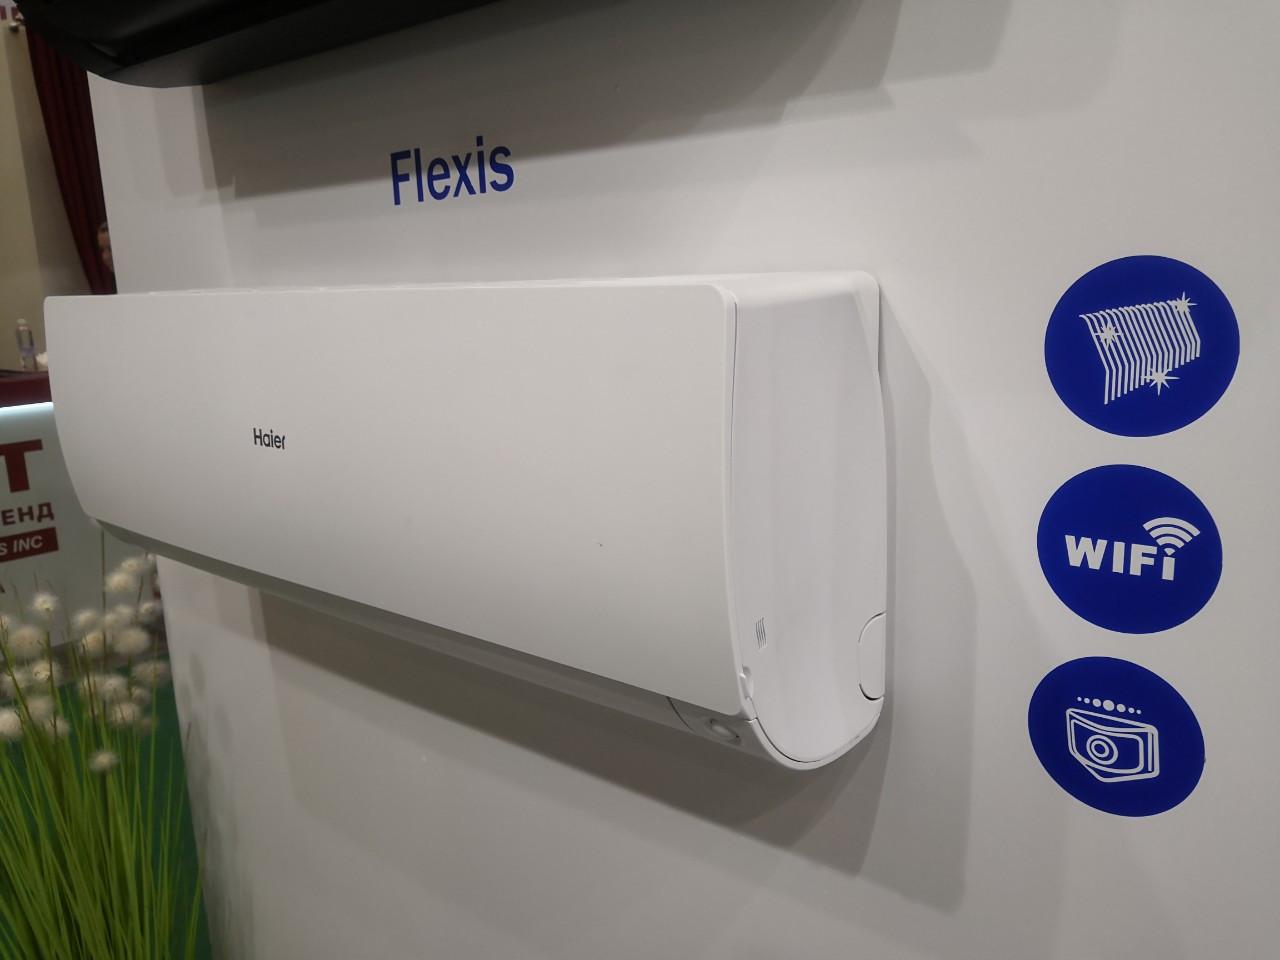 НОВИНКА 2019!!! Кондиционер HAIER FLEXIS AS50S2SF1FA Invertor + Wi-fi